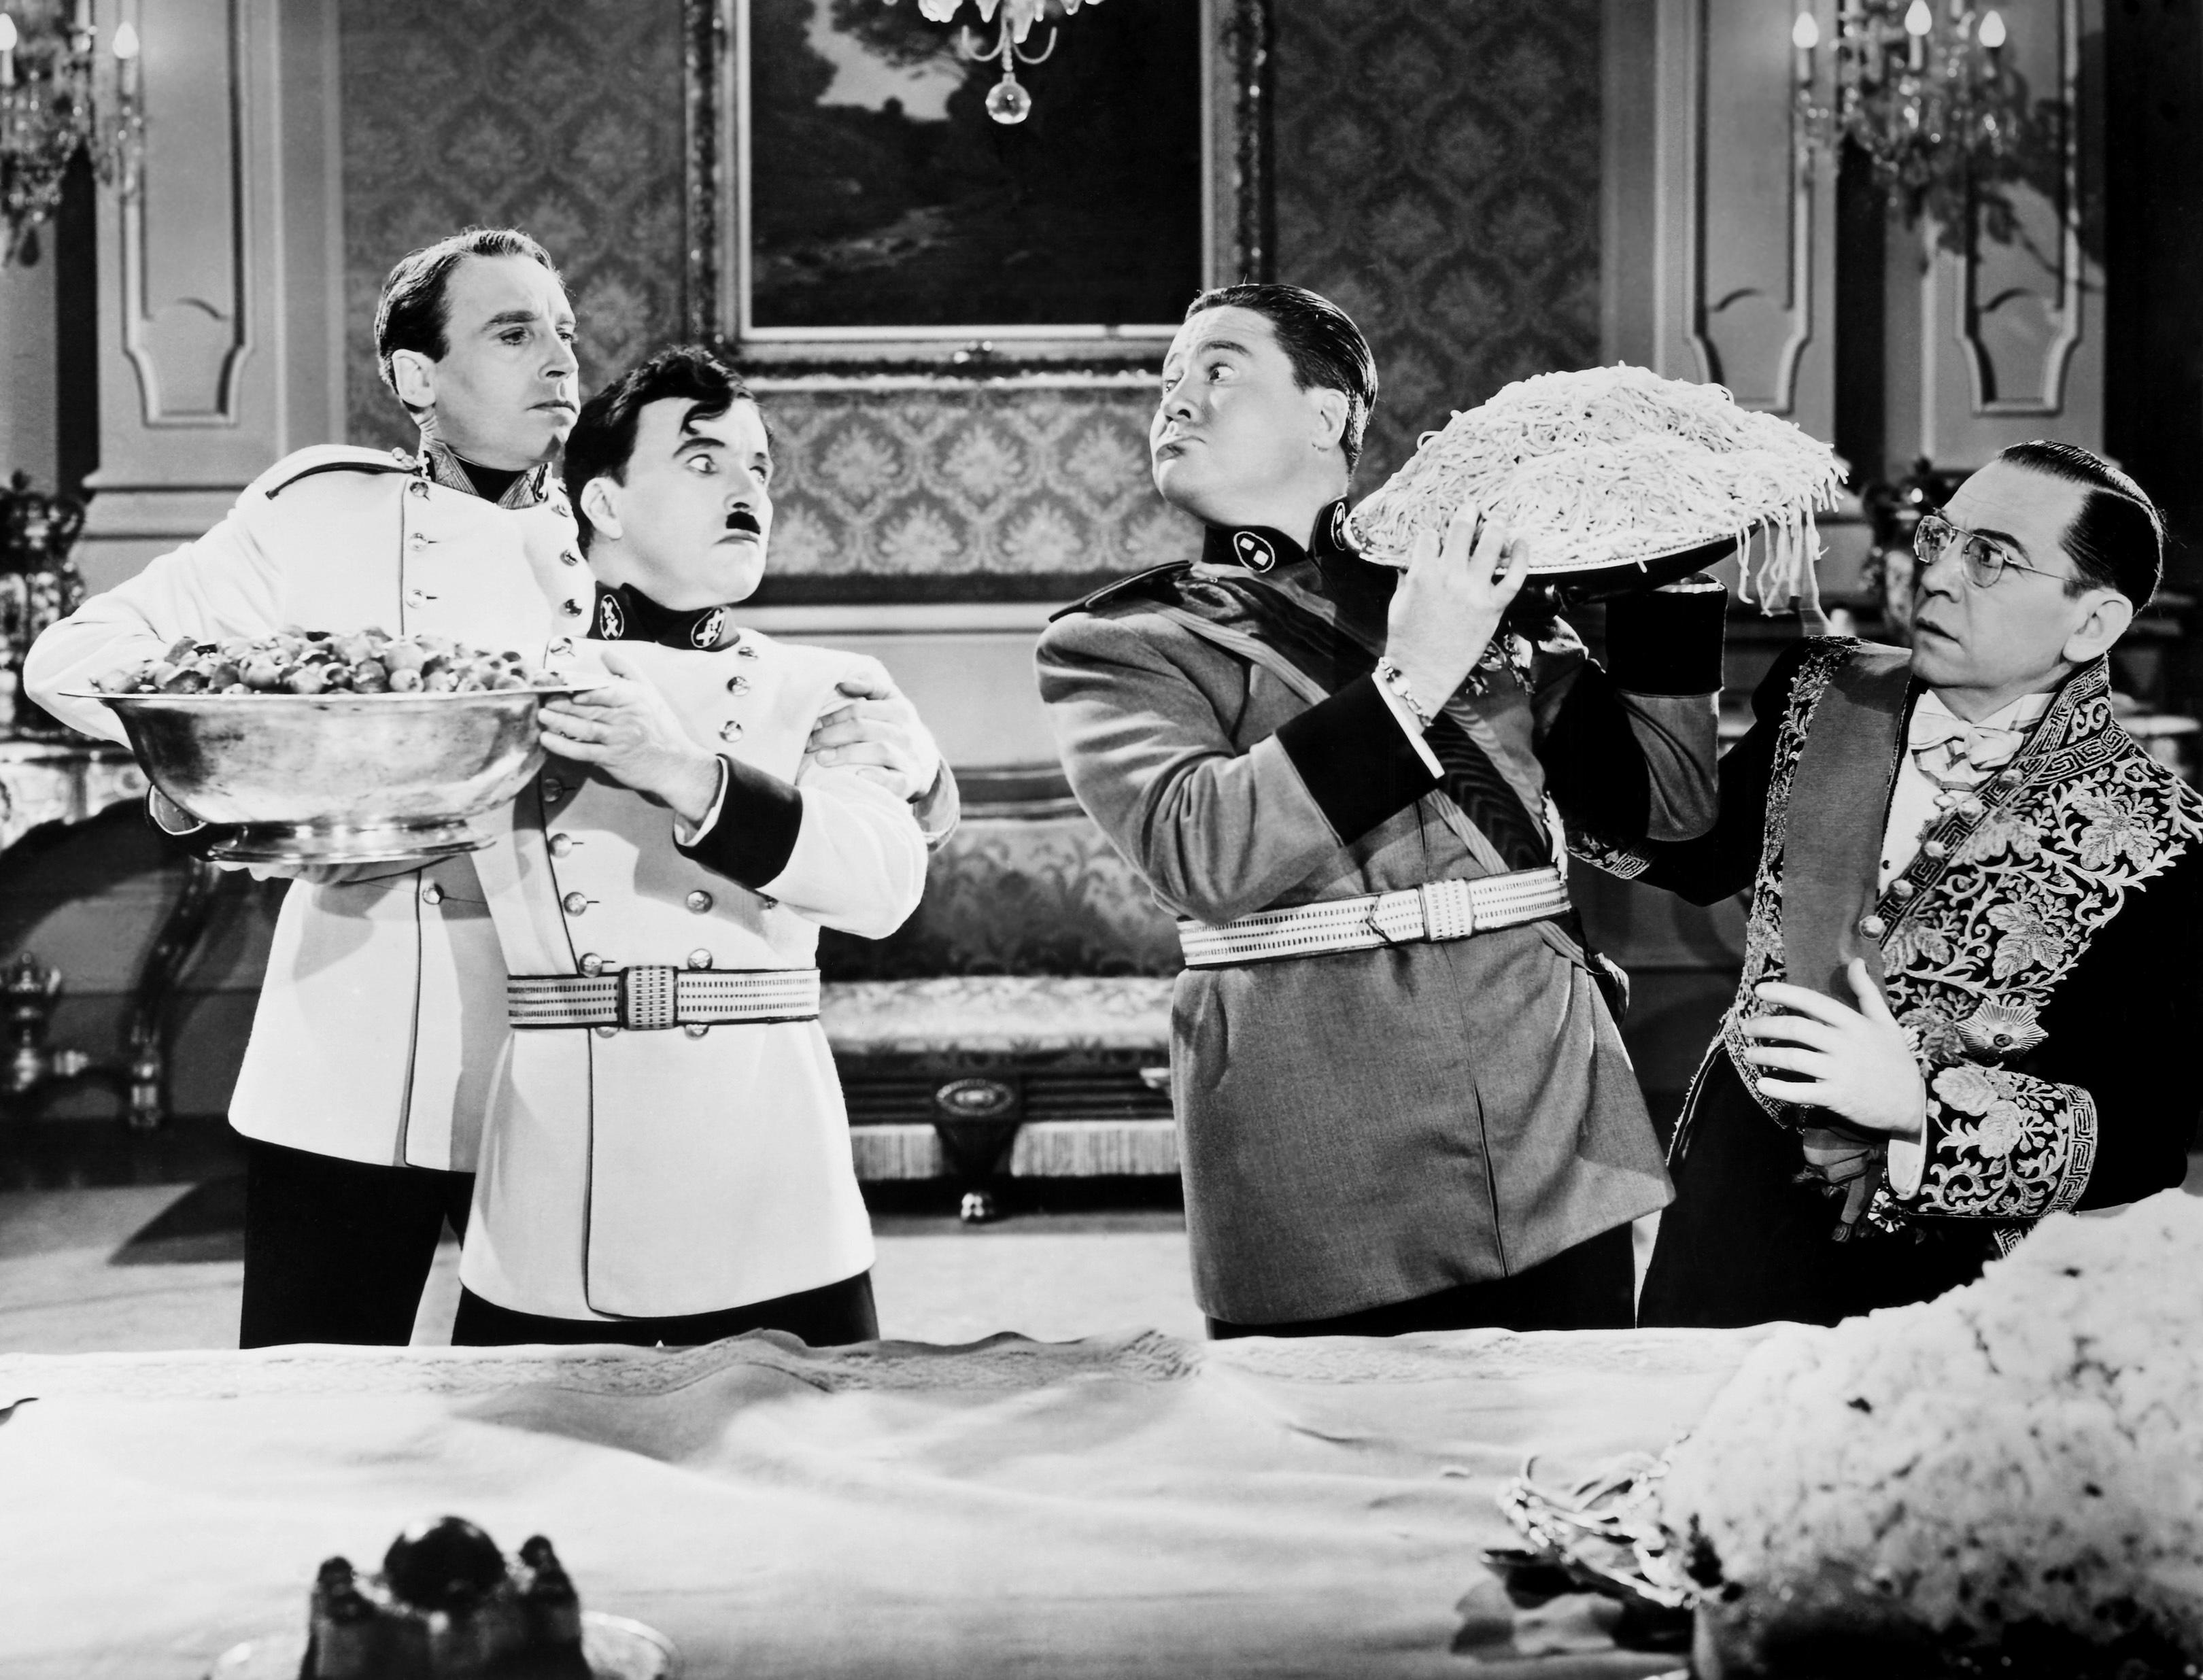 (L to R) Henry Daniell, Charlie Chaplin, Jack Oakie,Carter DeHaven